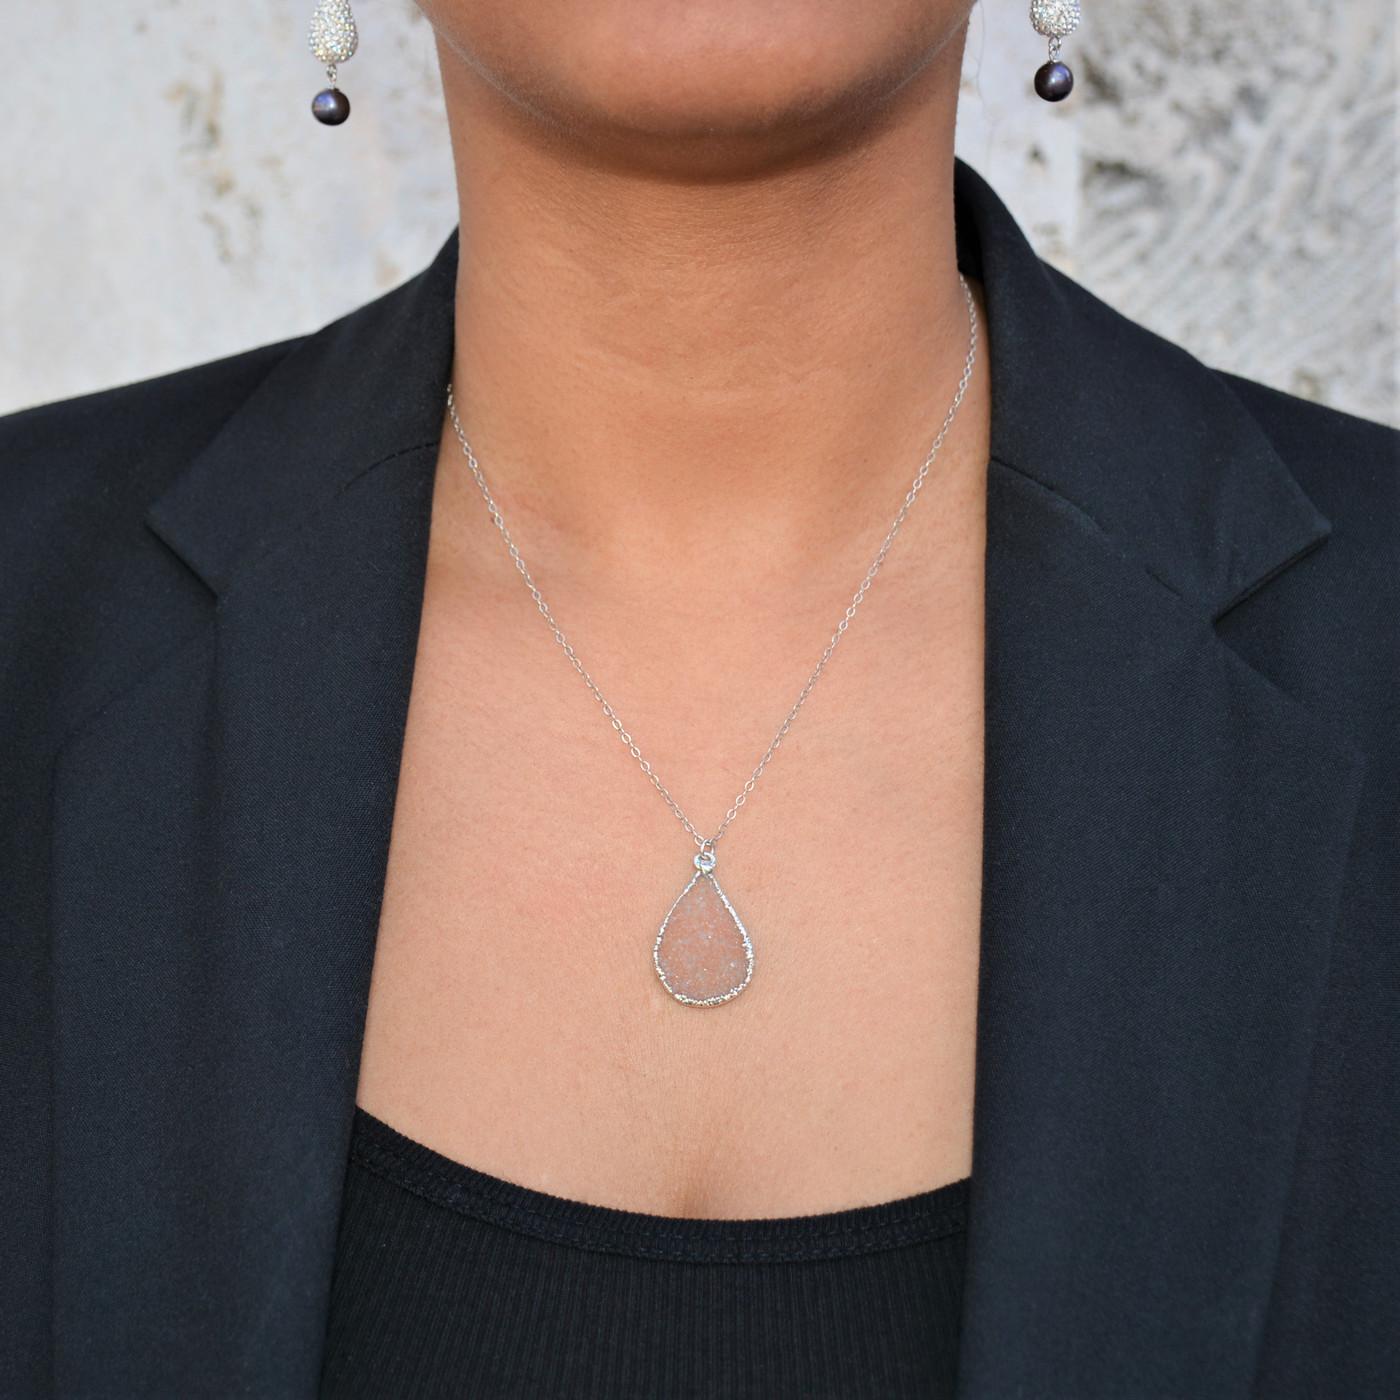 Sterling Silver Druzy Necklace Teardrop